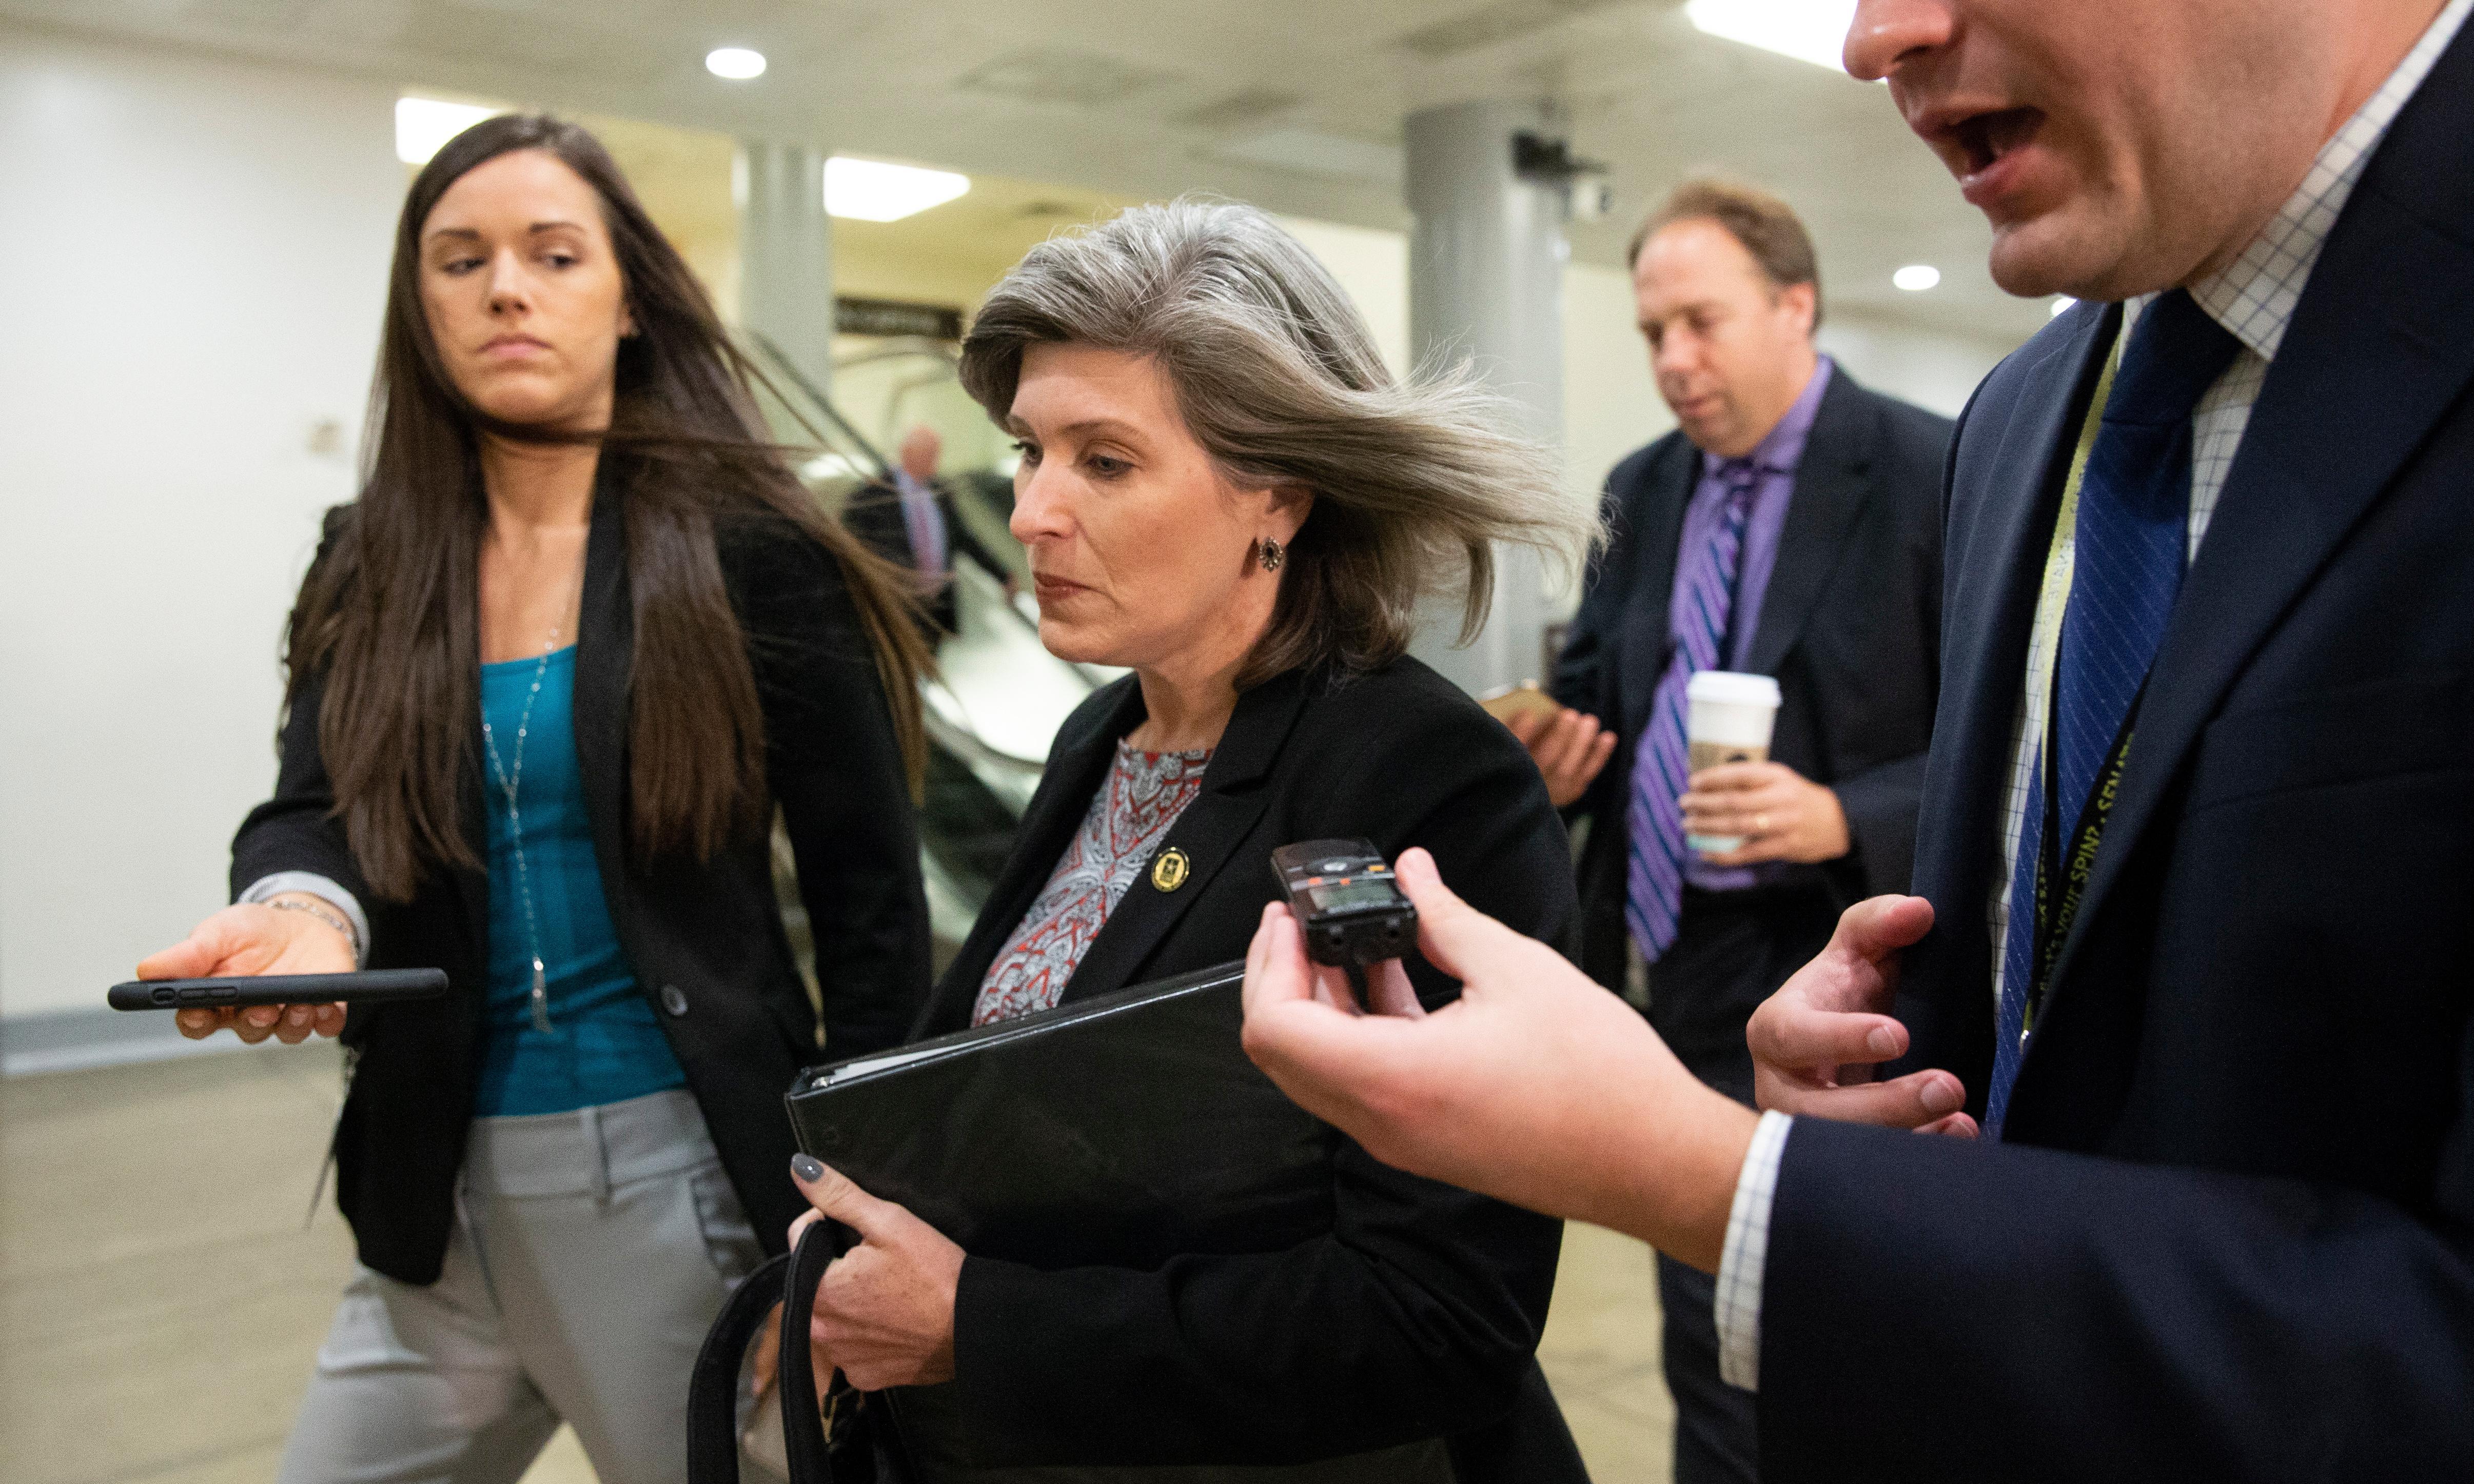 Iowa senator Joni Ernst put on the spot by impeachment process